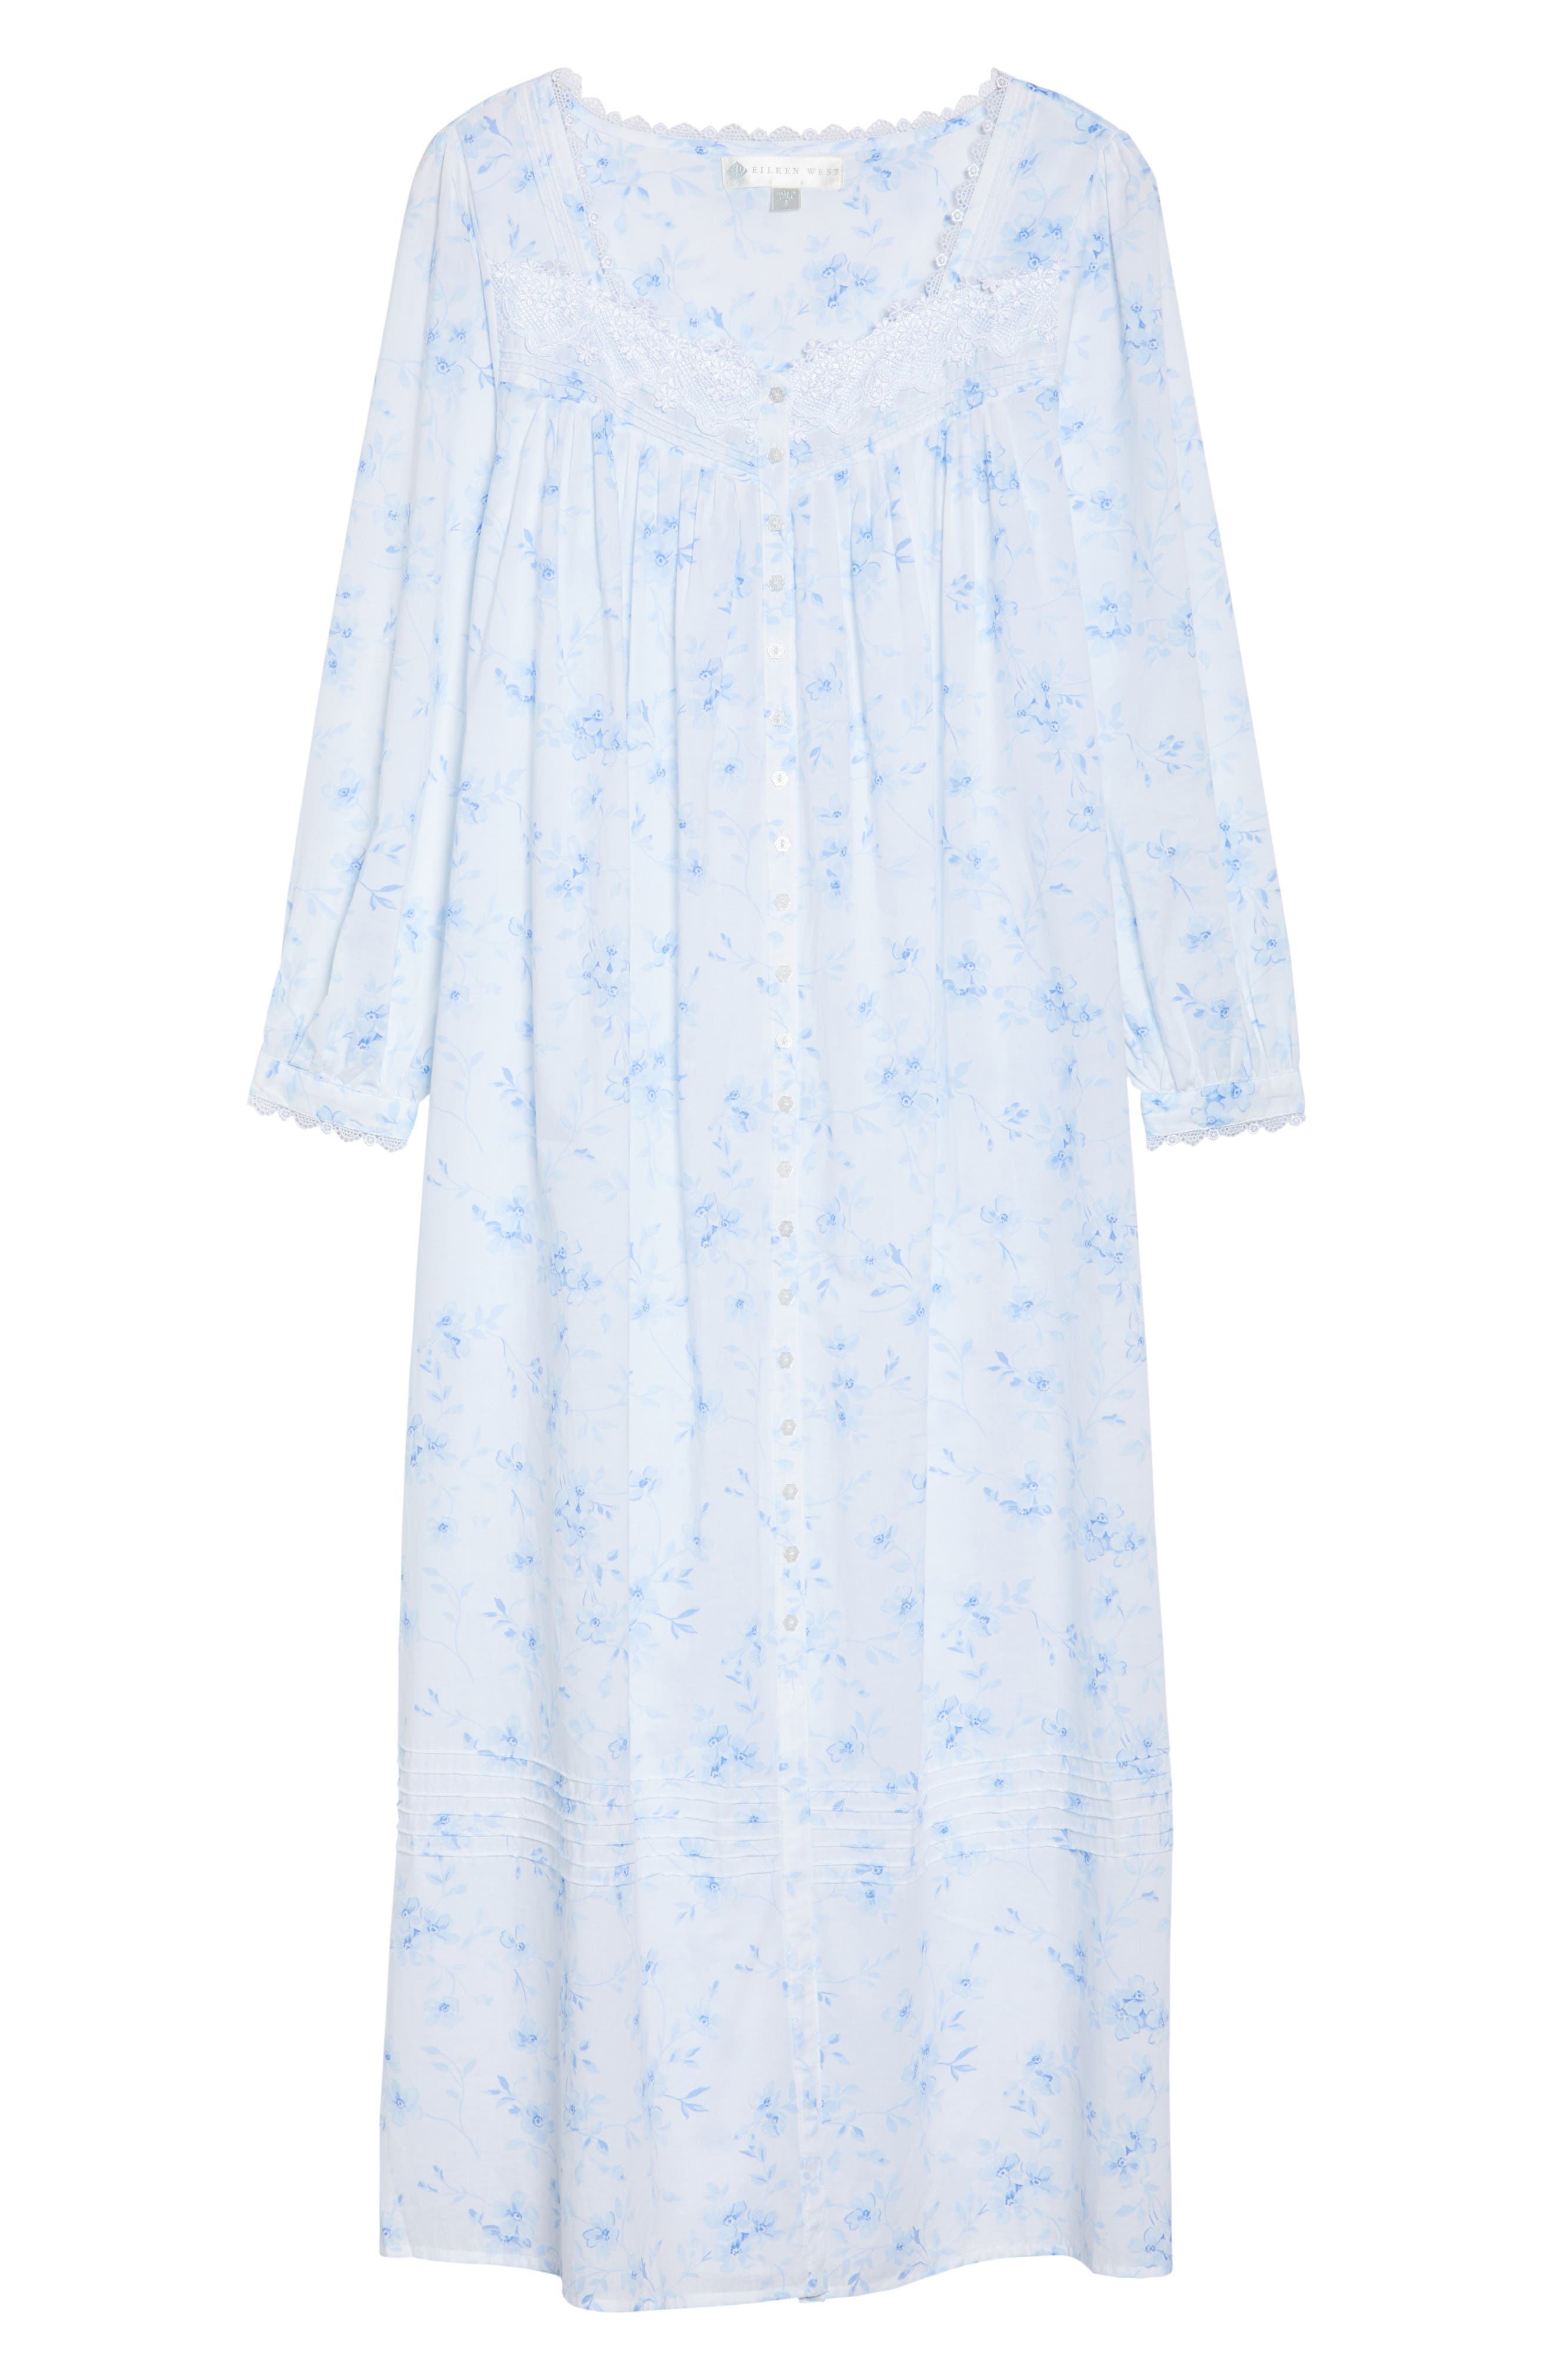 Cotton Lawn Ballet Nightgown,                             Alternate thumbnail 4, color,                             White Mono Floral